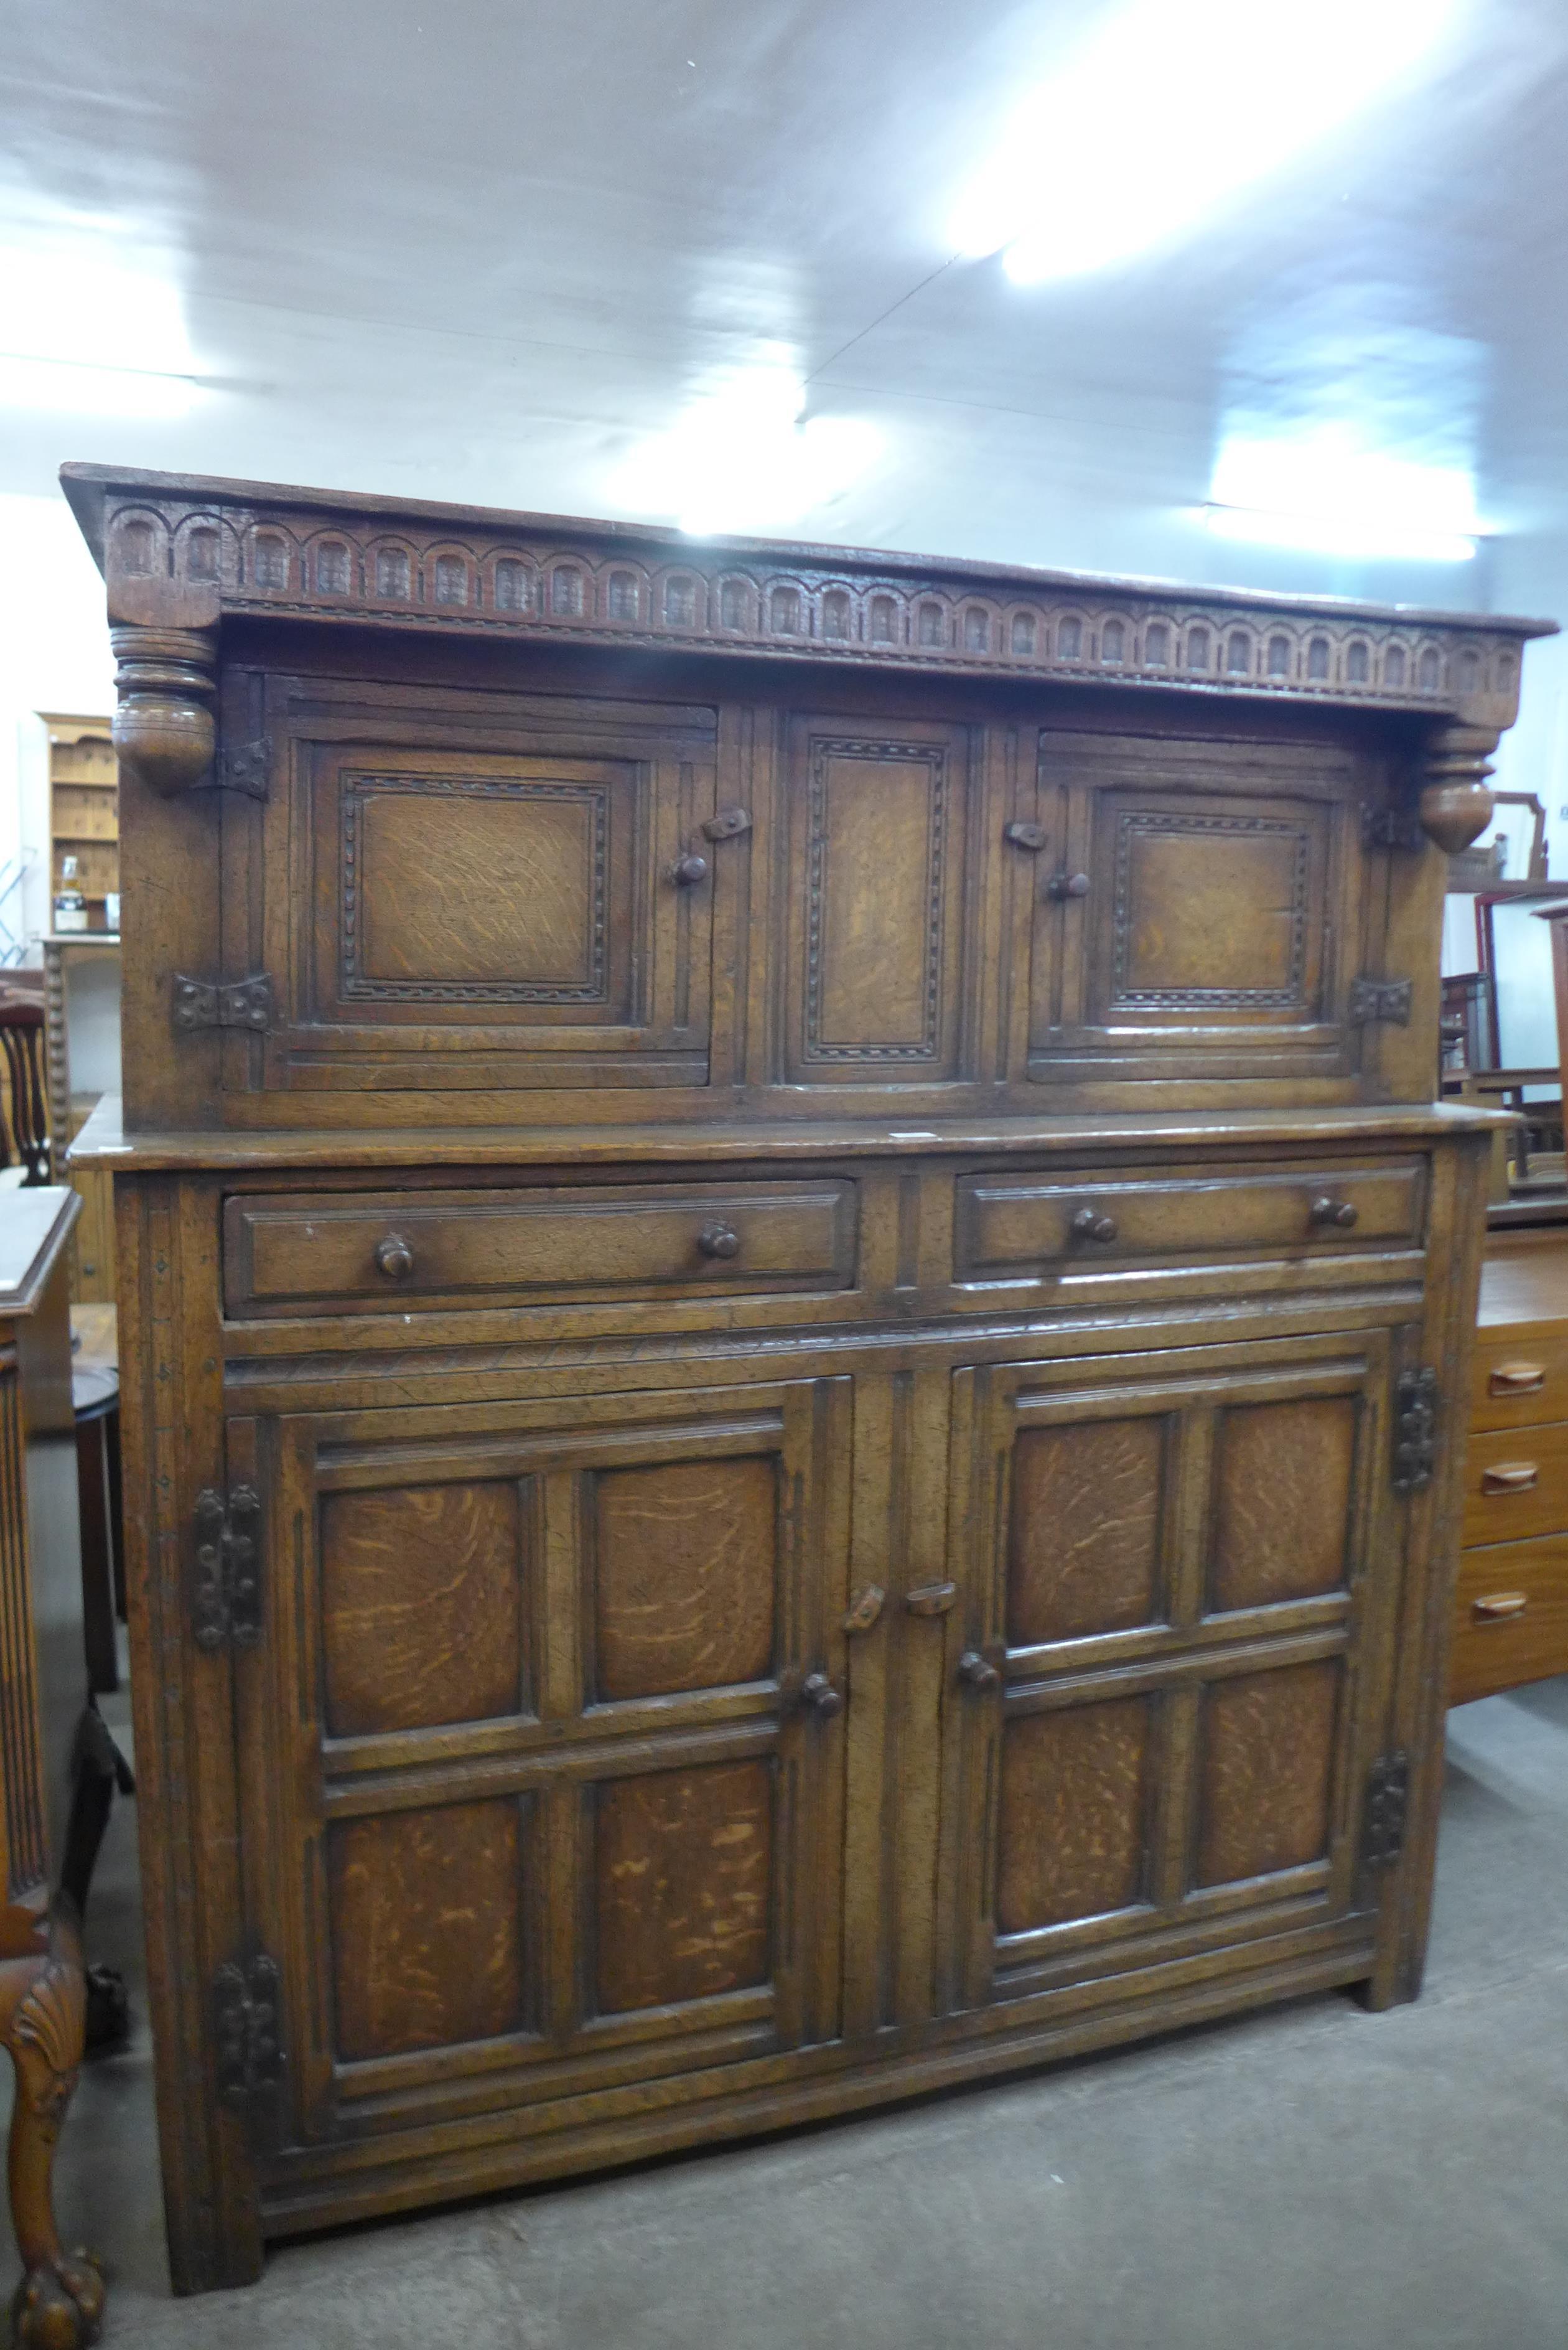 A carved Ipswich oak court cupboard